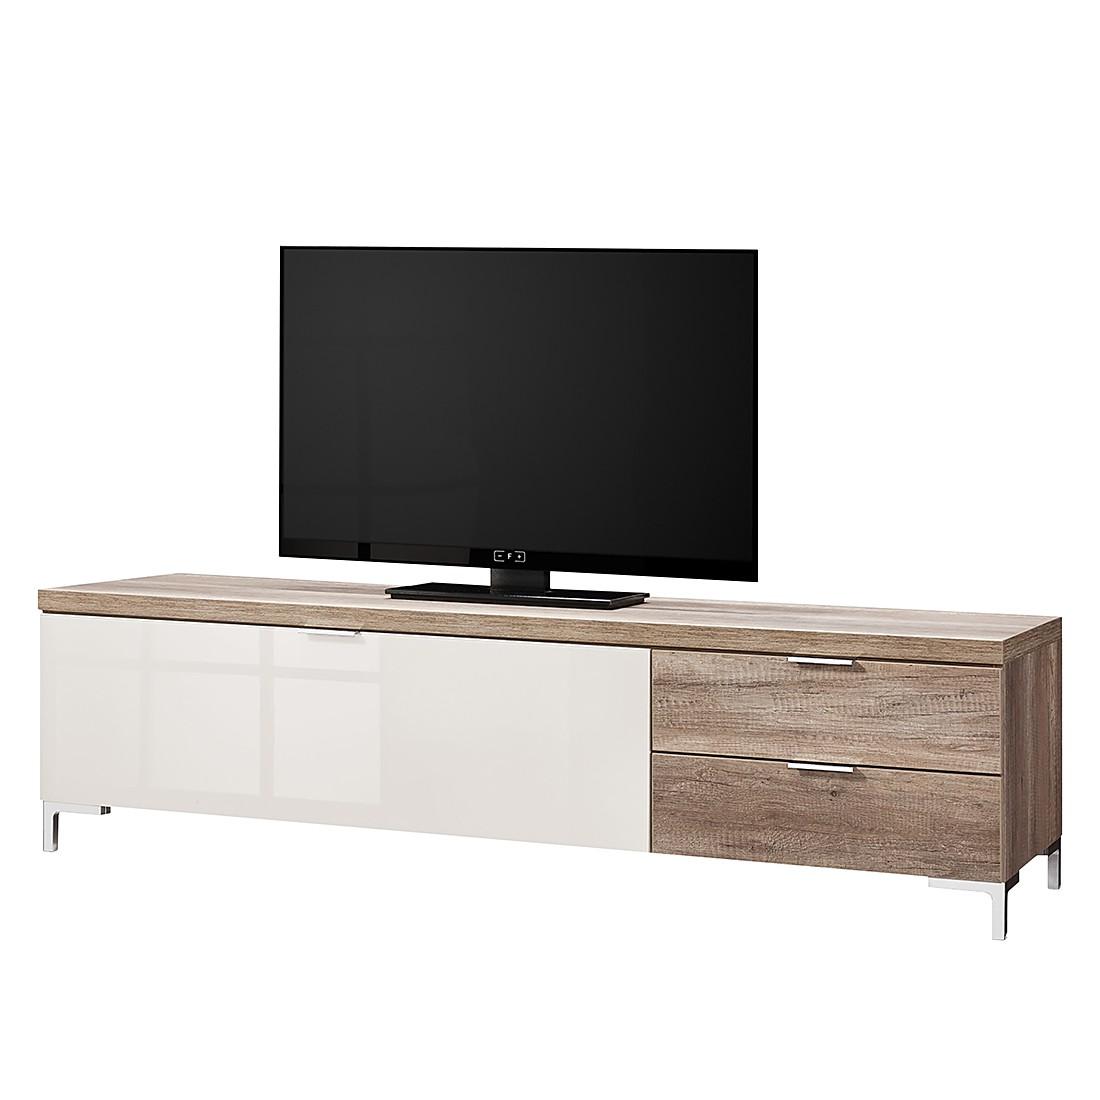 Tv-meubel Cleo III - wild eikenhoutkleurig - zandkleurig glas, Cs Schmal